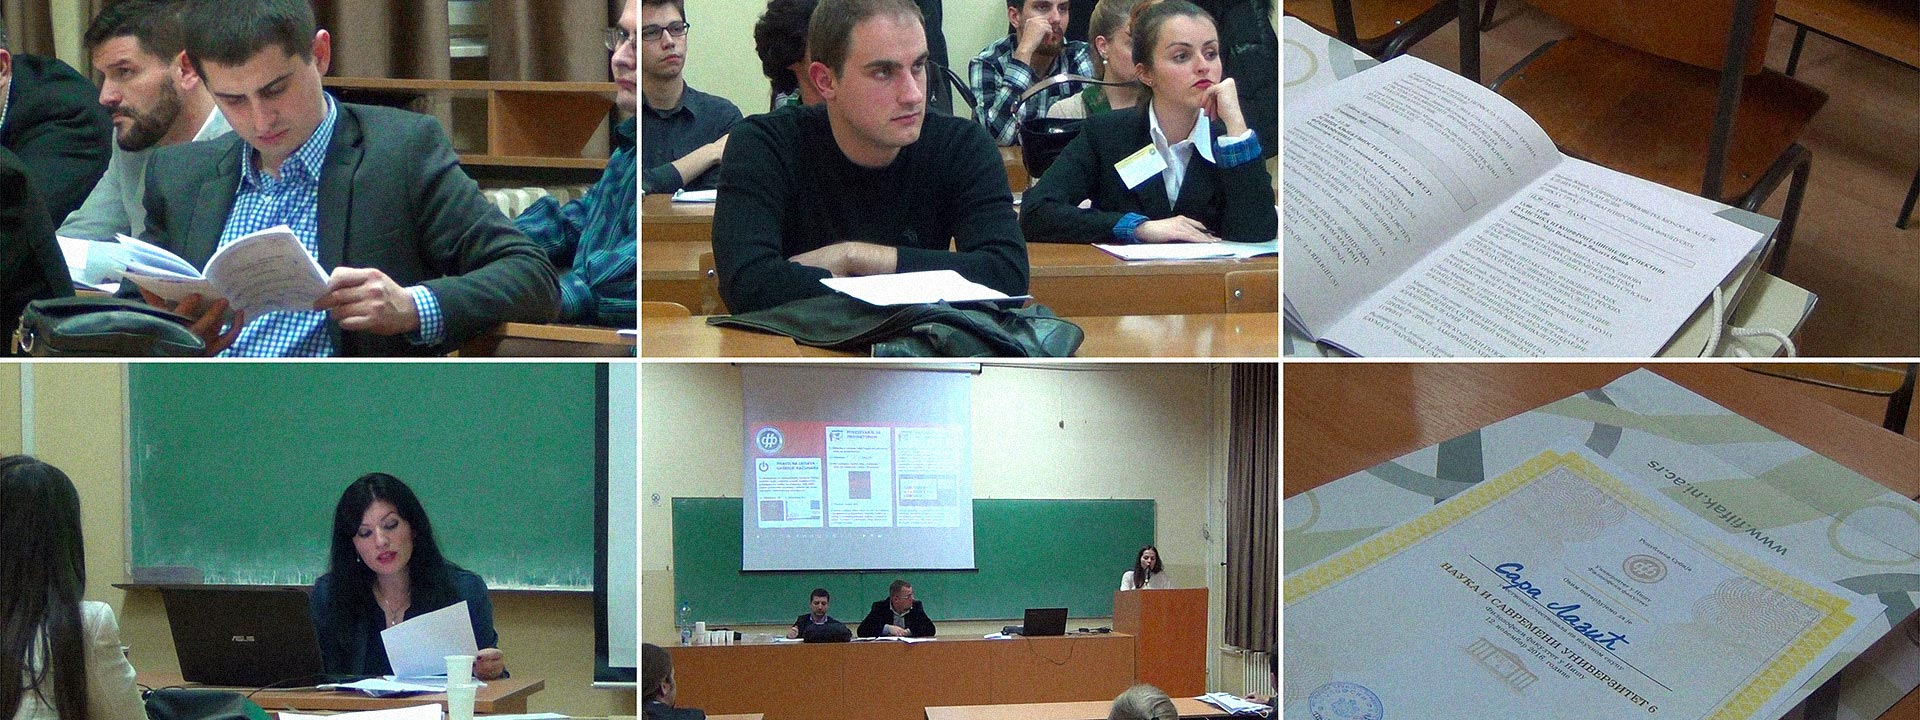 Наука и савремени универзитет 7